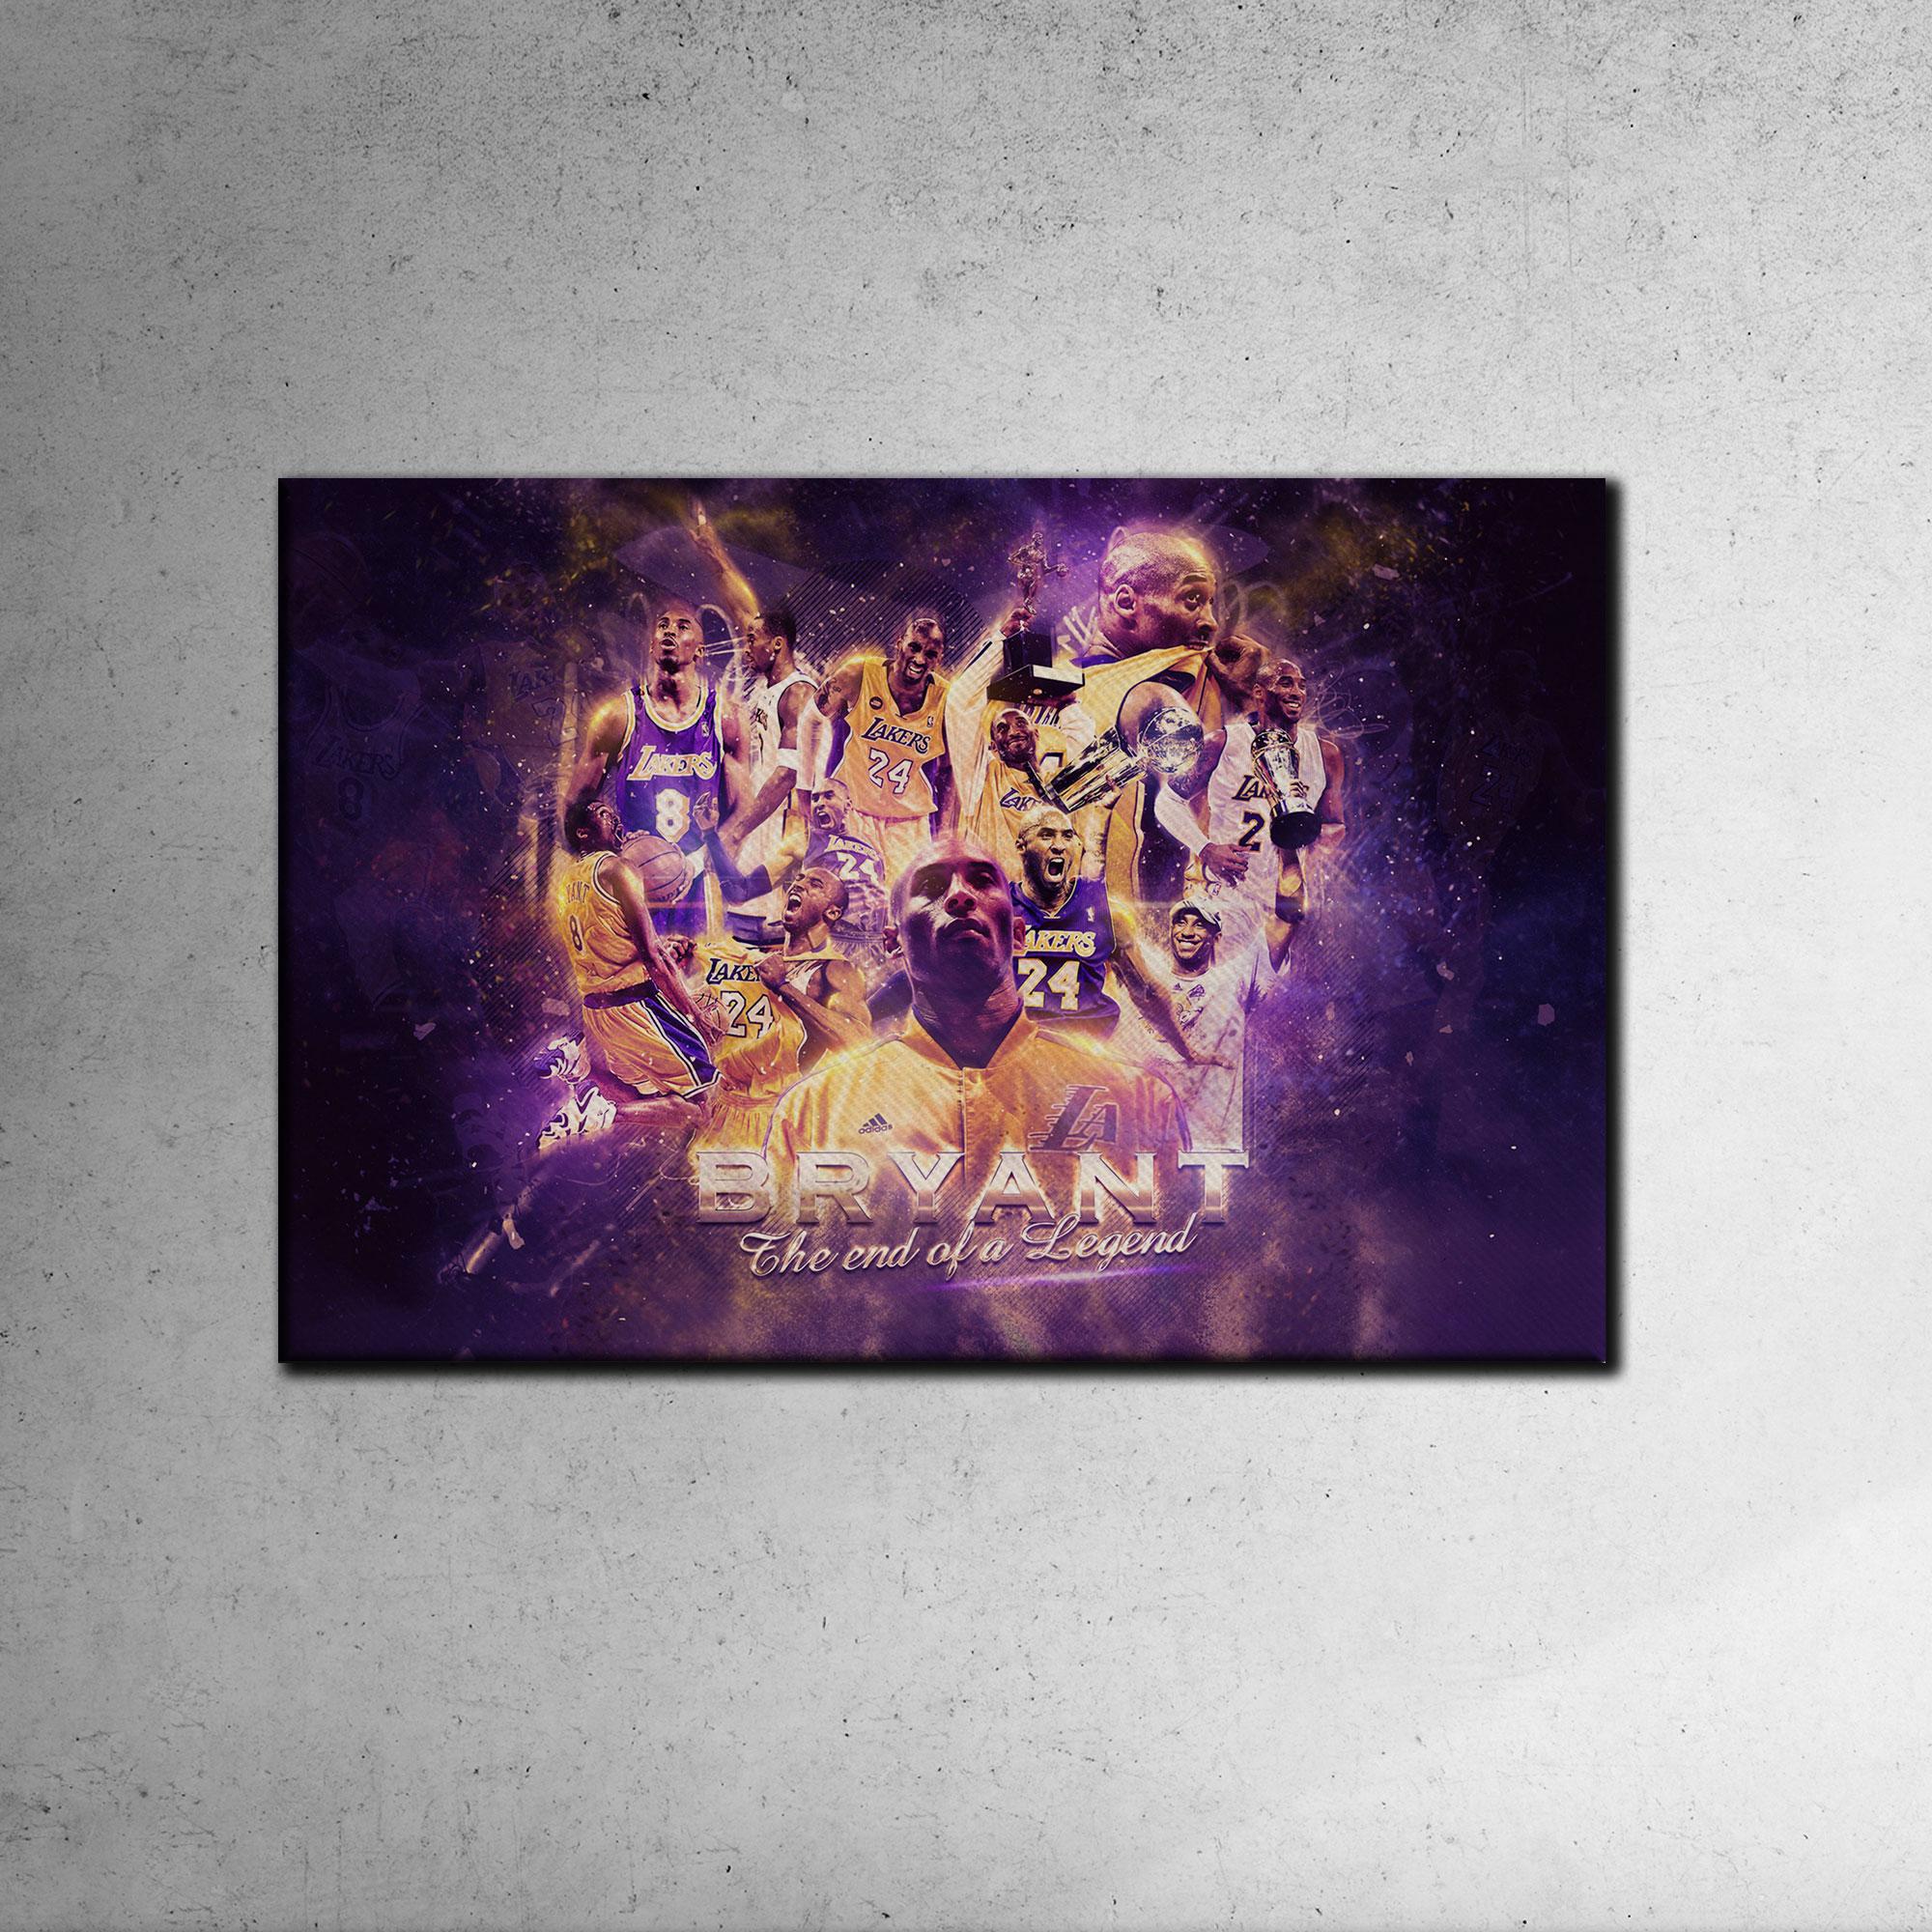 Kobe Bryant Canvas Tablo (Nba-canvas-kobe1)